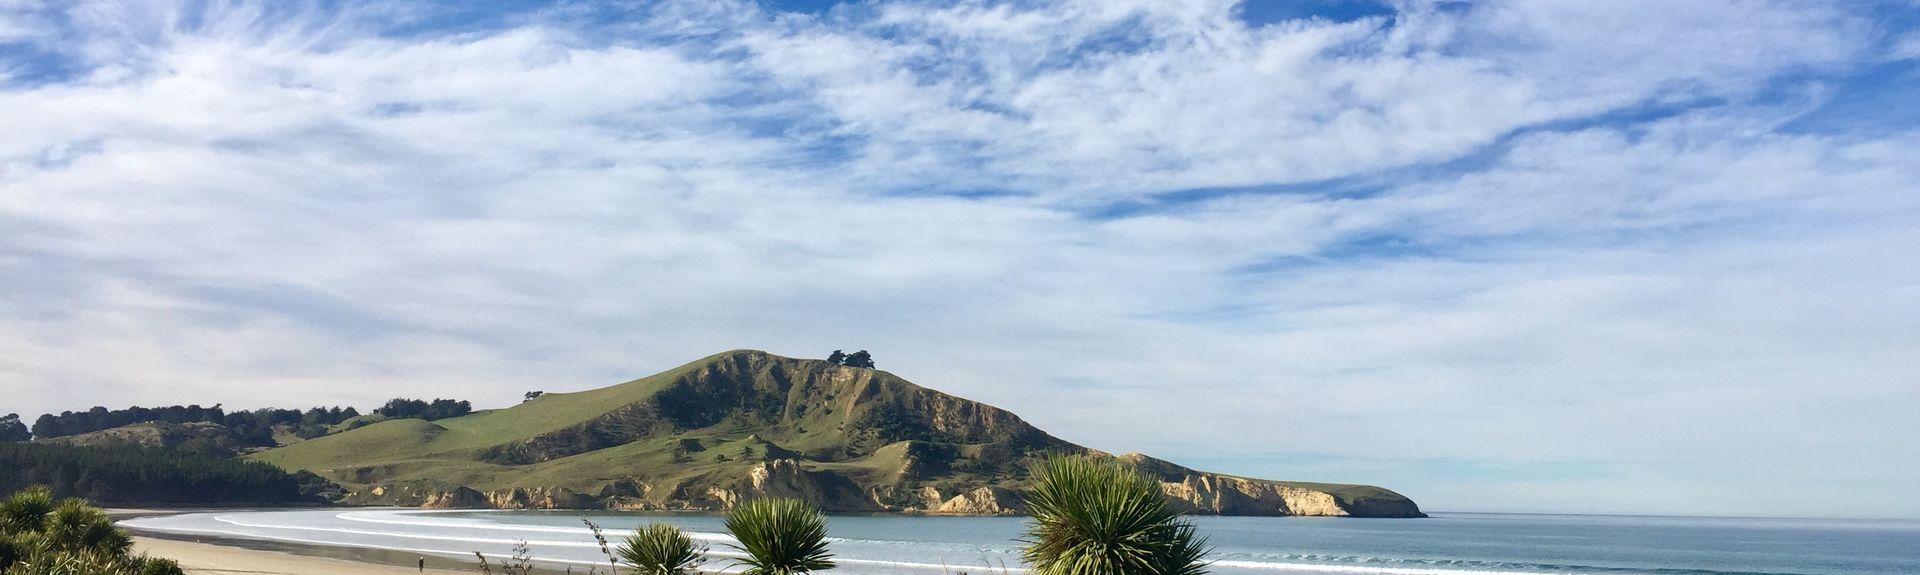 Seacliff, Dunedin City, Otago, New Zealand